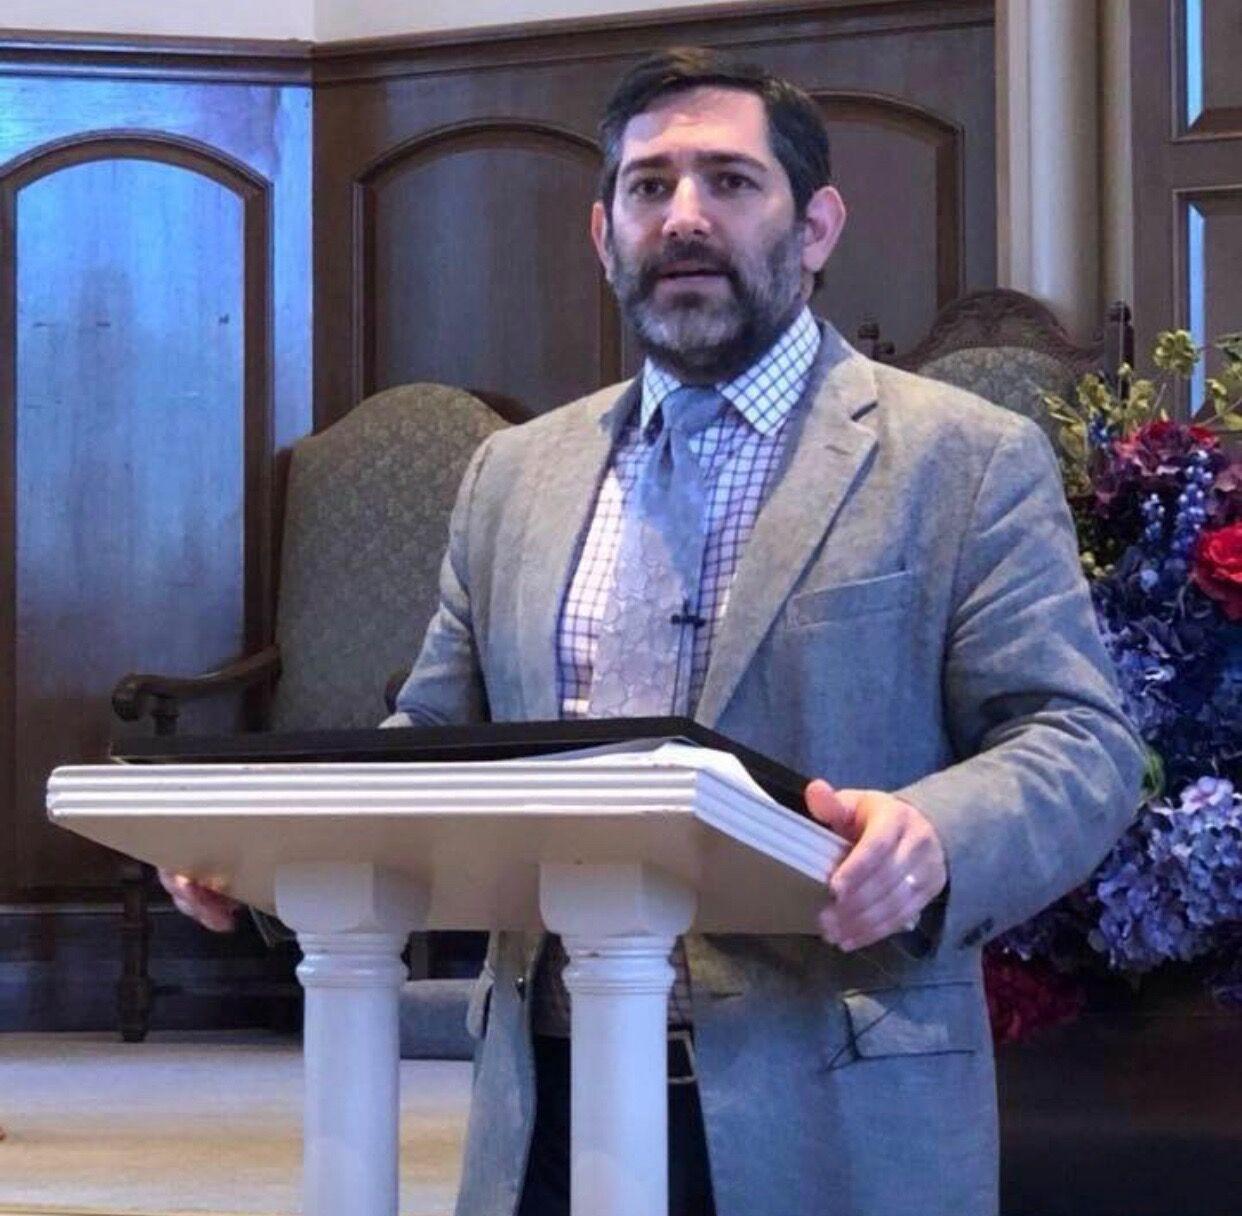 Rabbi Arnowitz Attends AIPAC's Annual Gathering